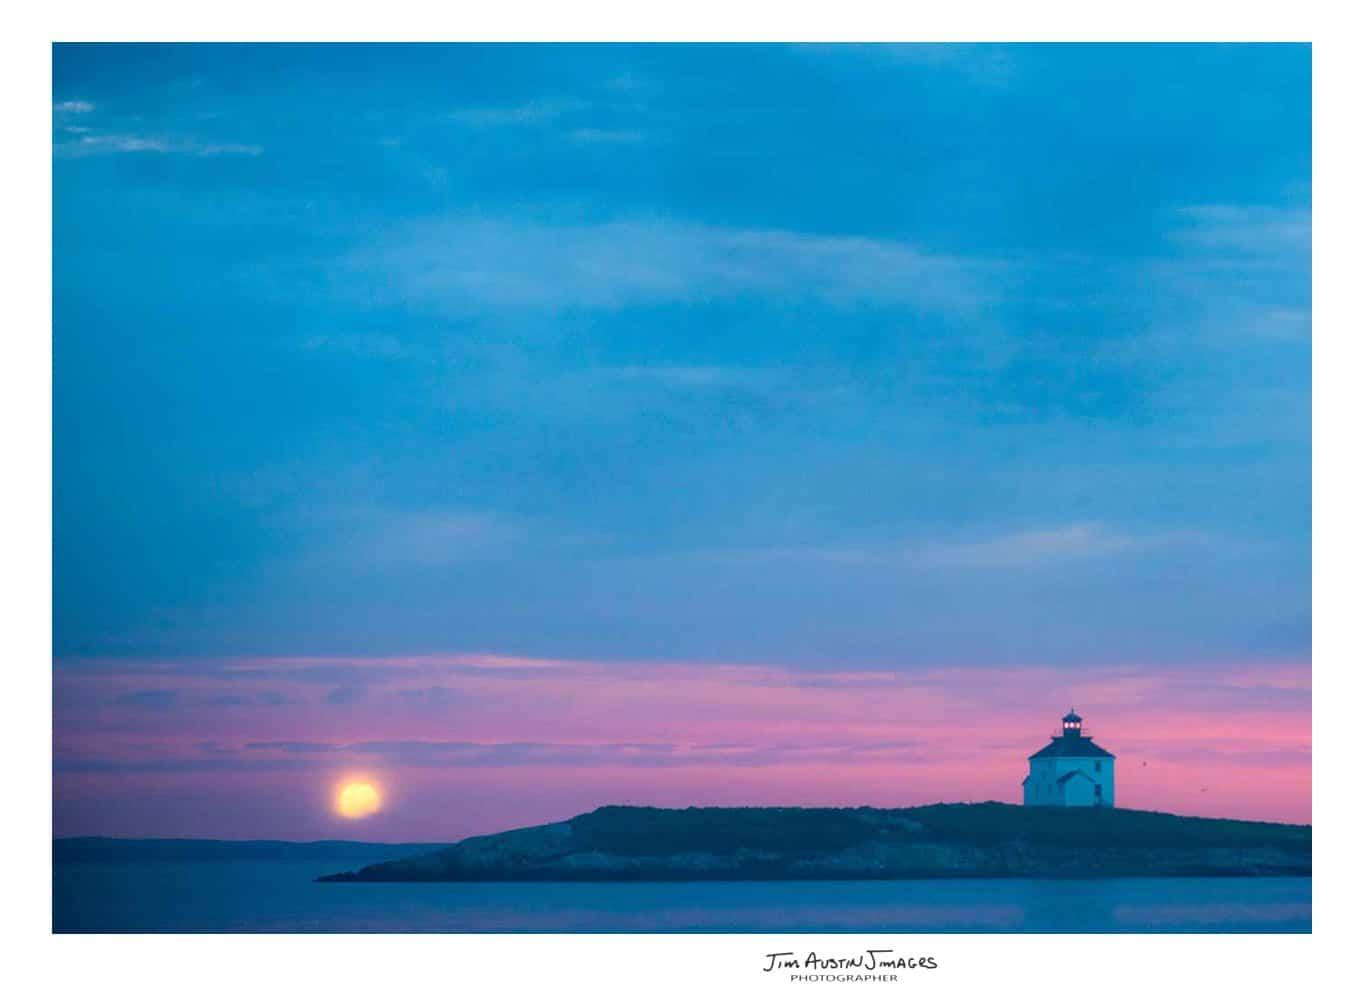 Jim-Austin-Jimages-Rook-Island-Full-Moon-Lighthouse-85-mm